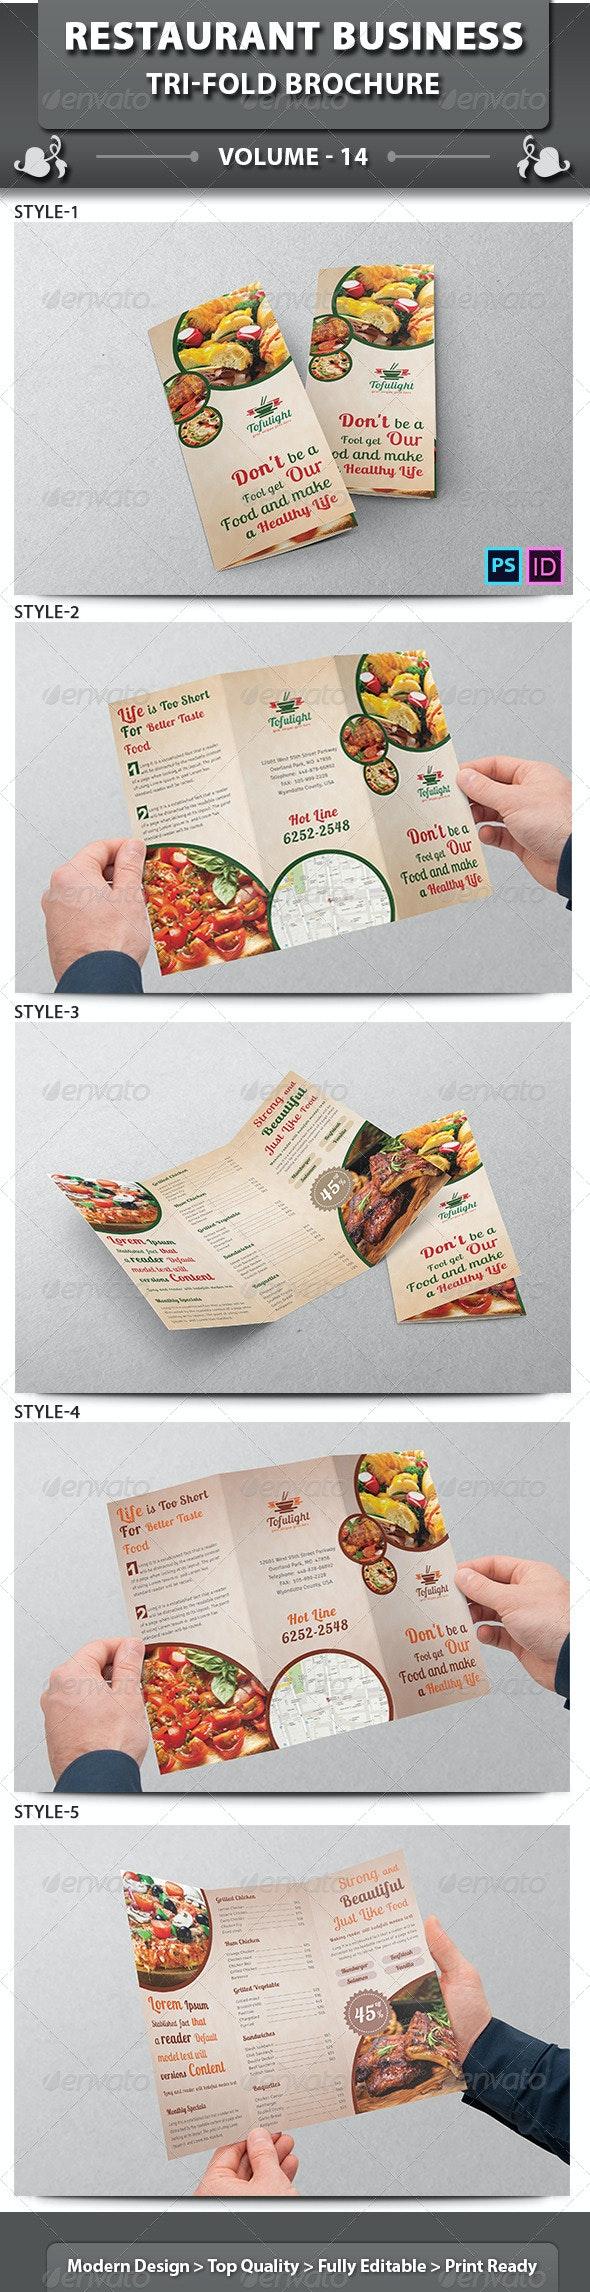 Restaurant Business Tri-fold Brochure   Volume 14 - Informational Brochures